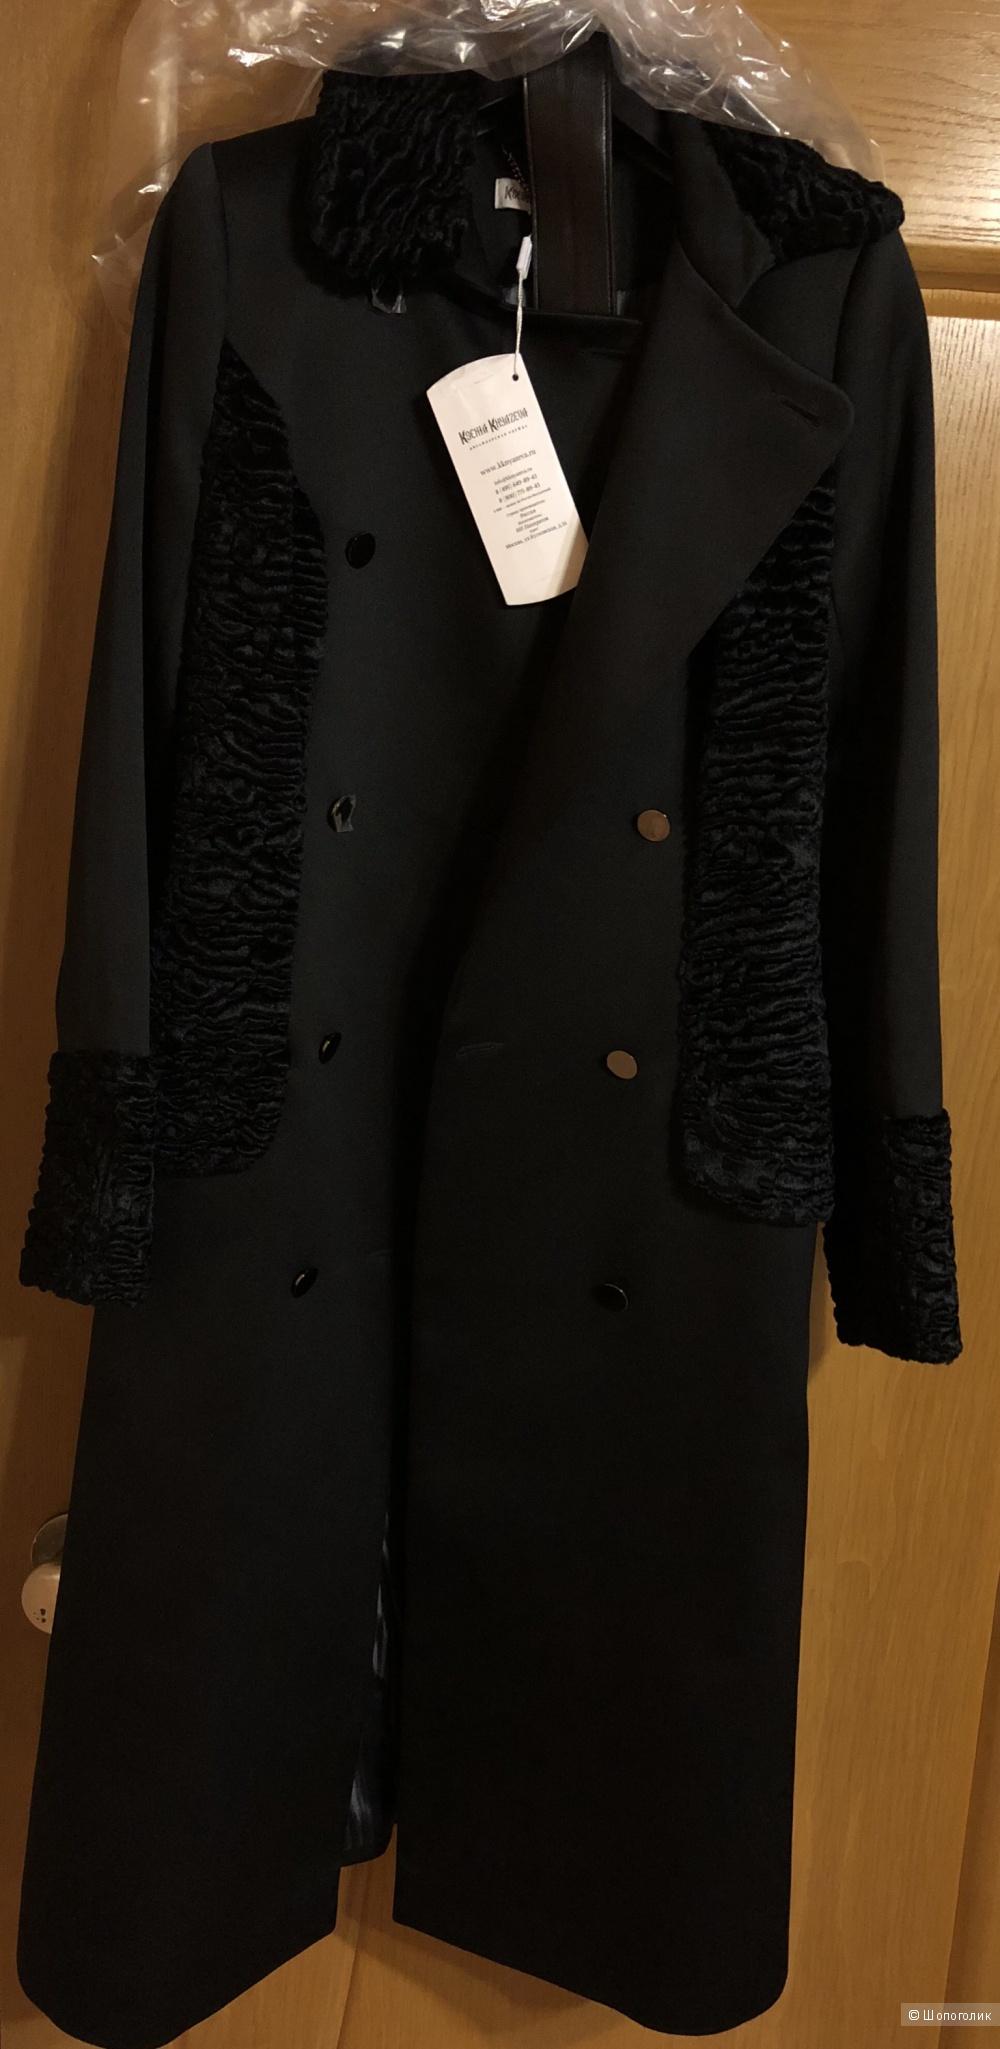 Пальто Ksenia Knyazeva/Ксения Князева, размер 42-44